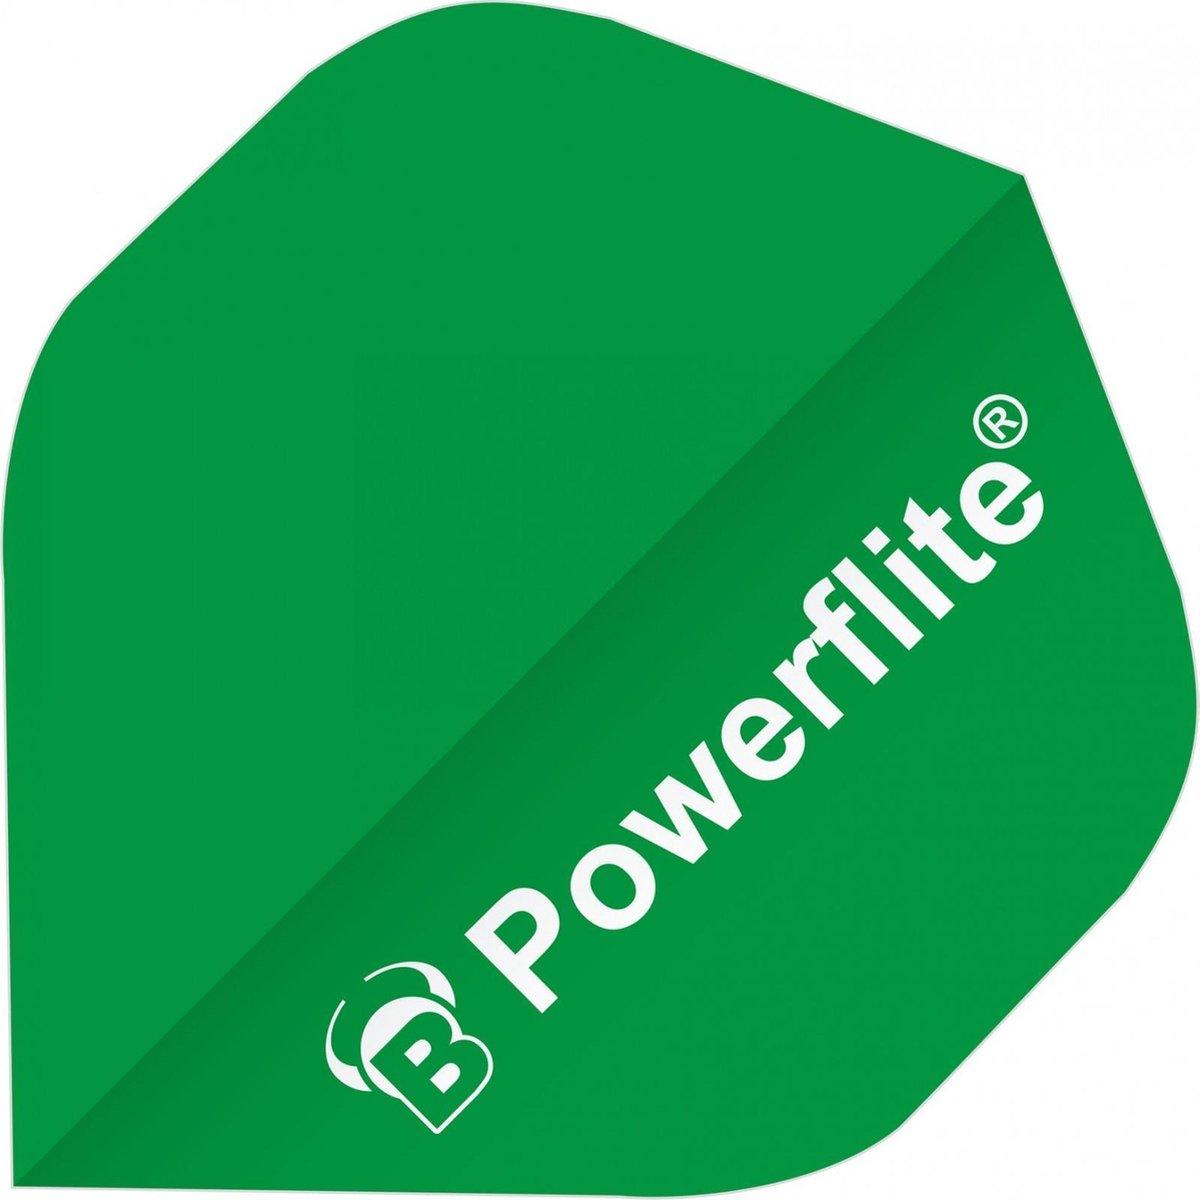 Bull's Powerflight Groen 100 Micron